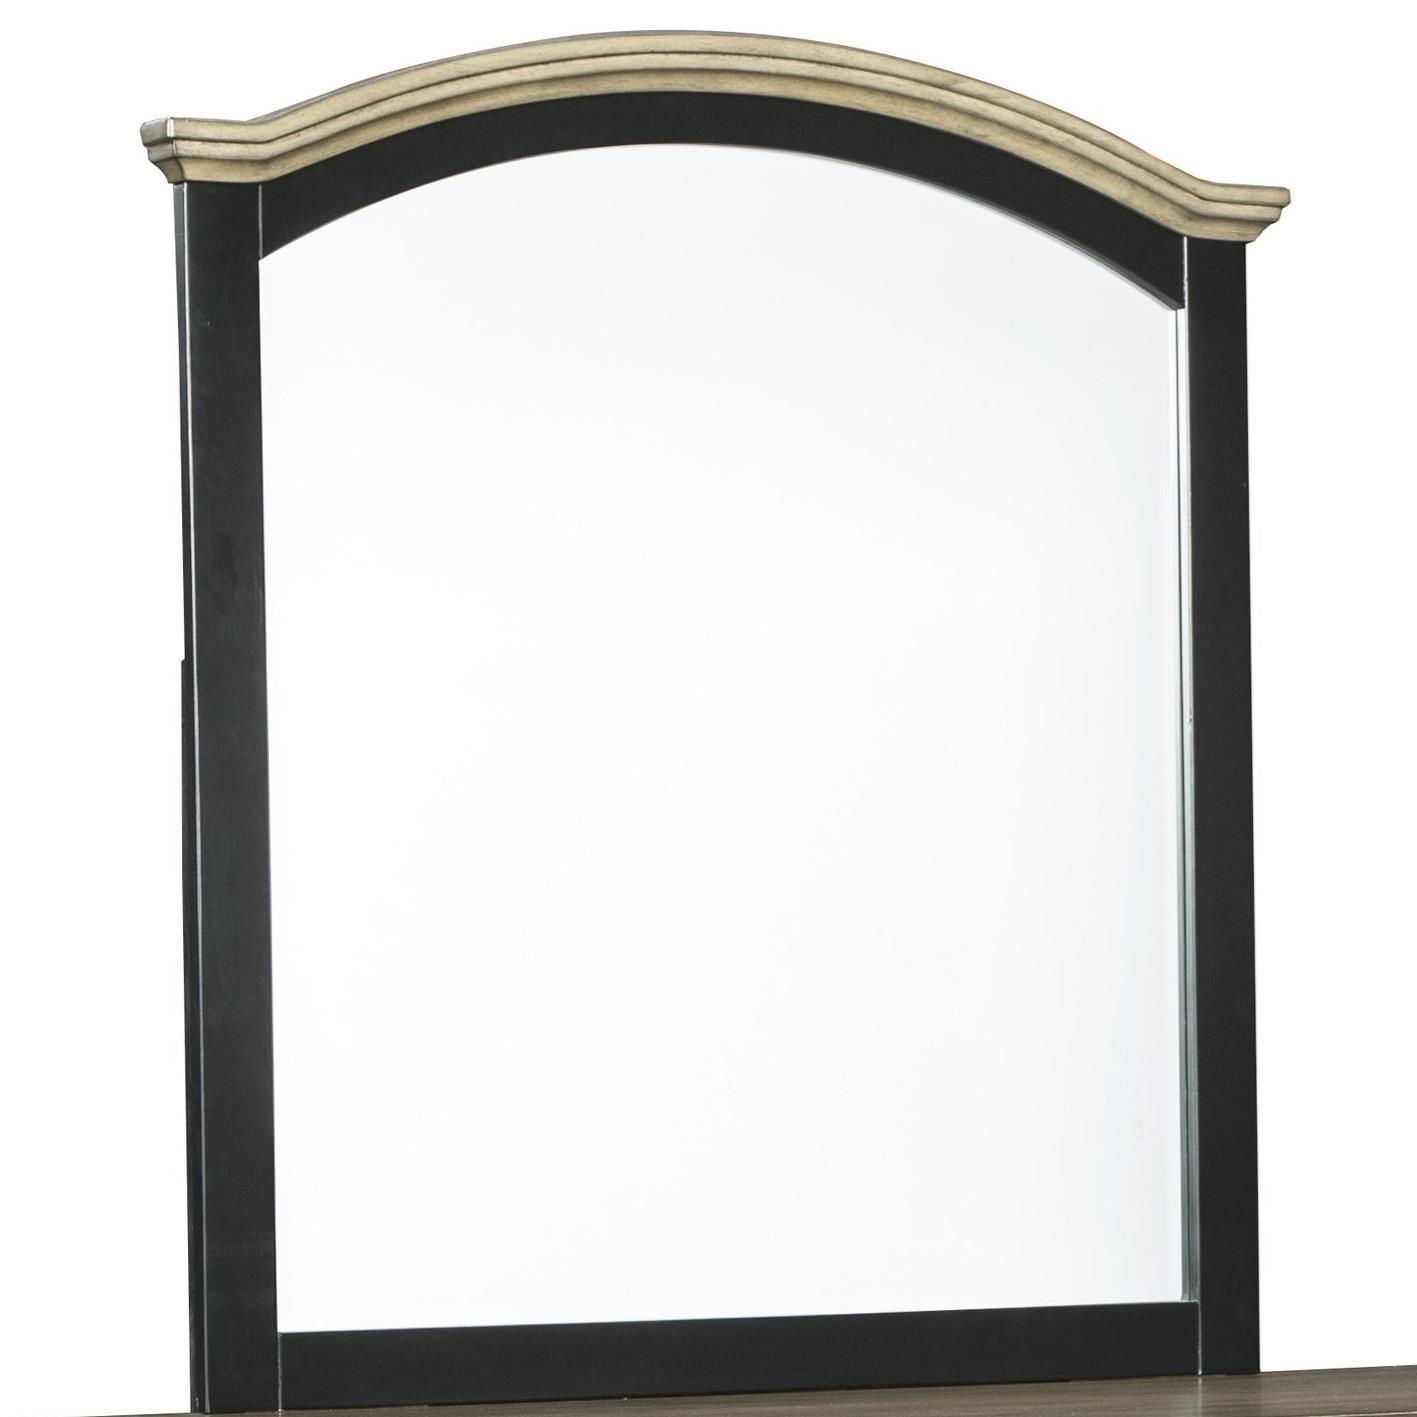 Signature Design by Ashley Froshburg Bedroom Mirror - Item Number: B628-36